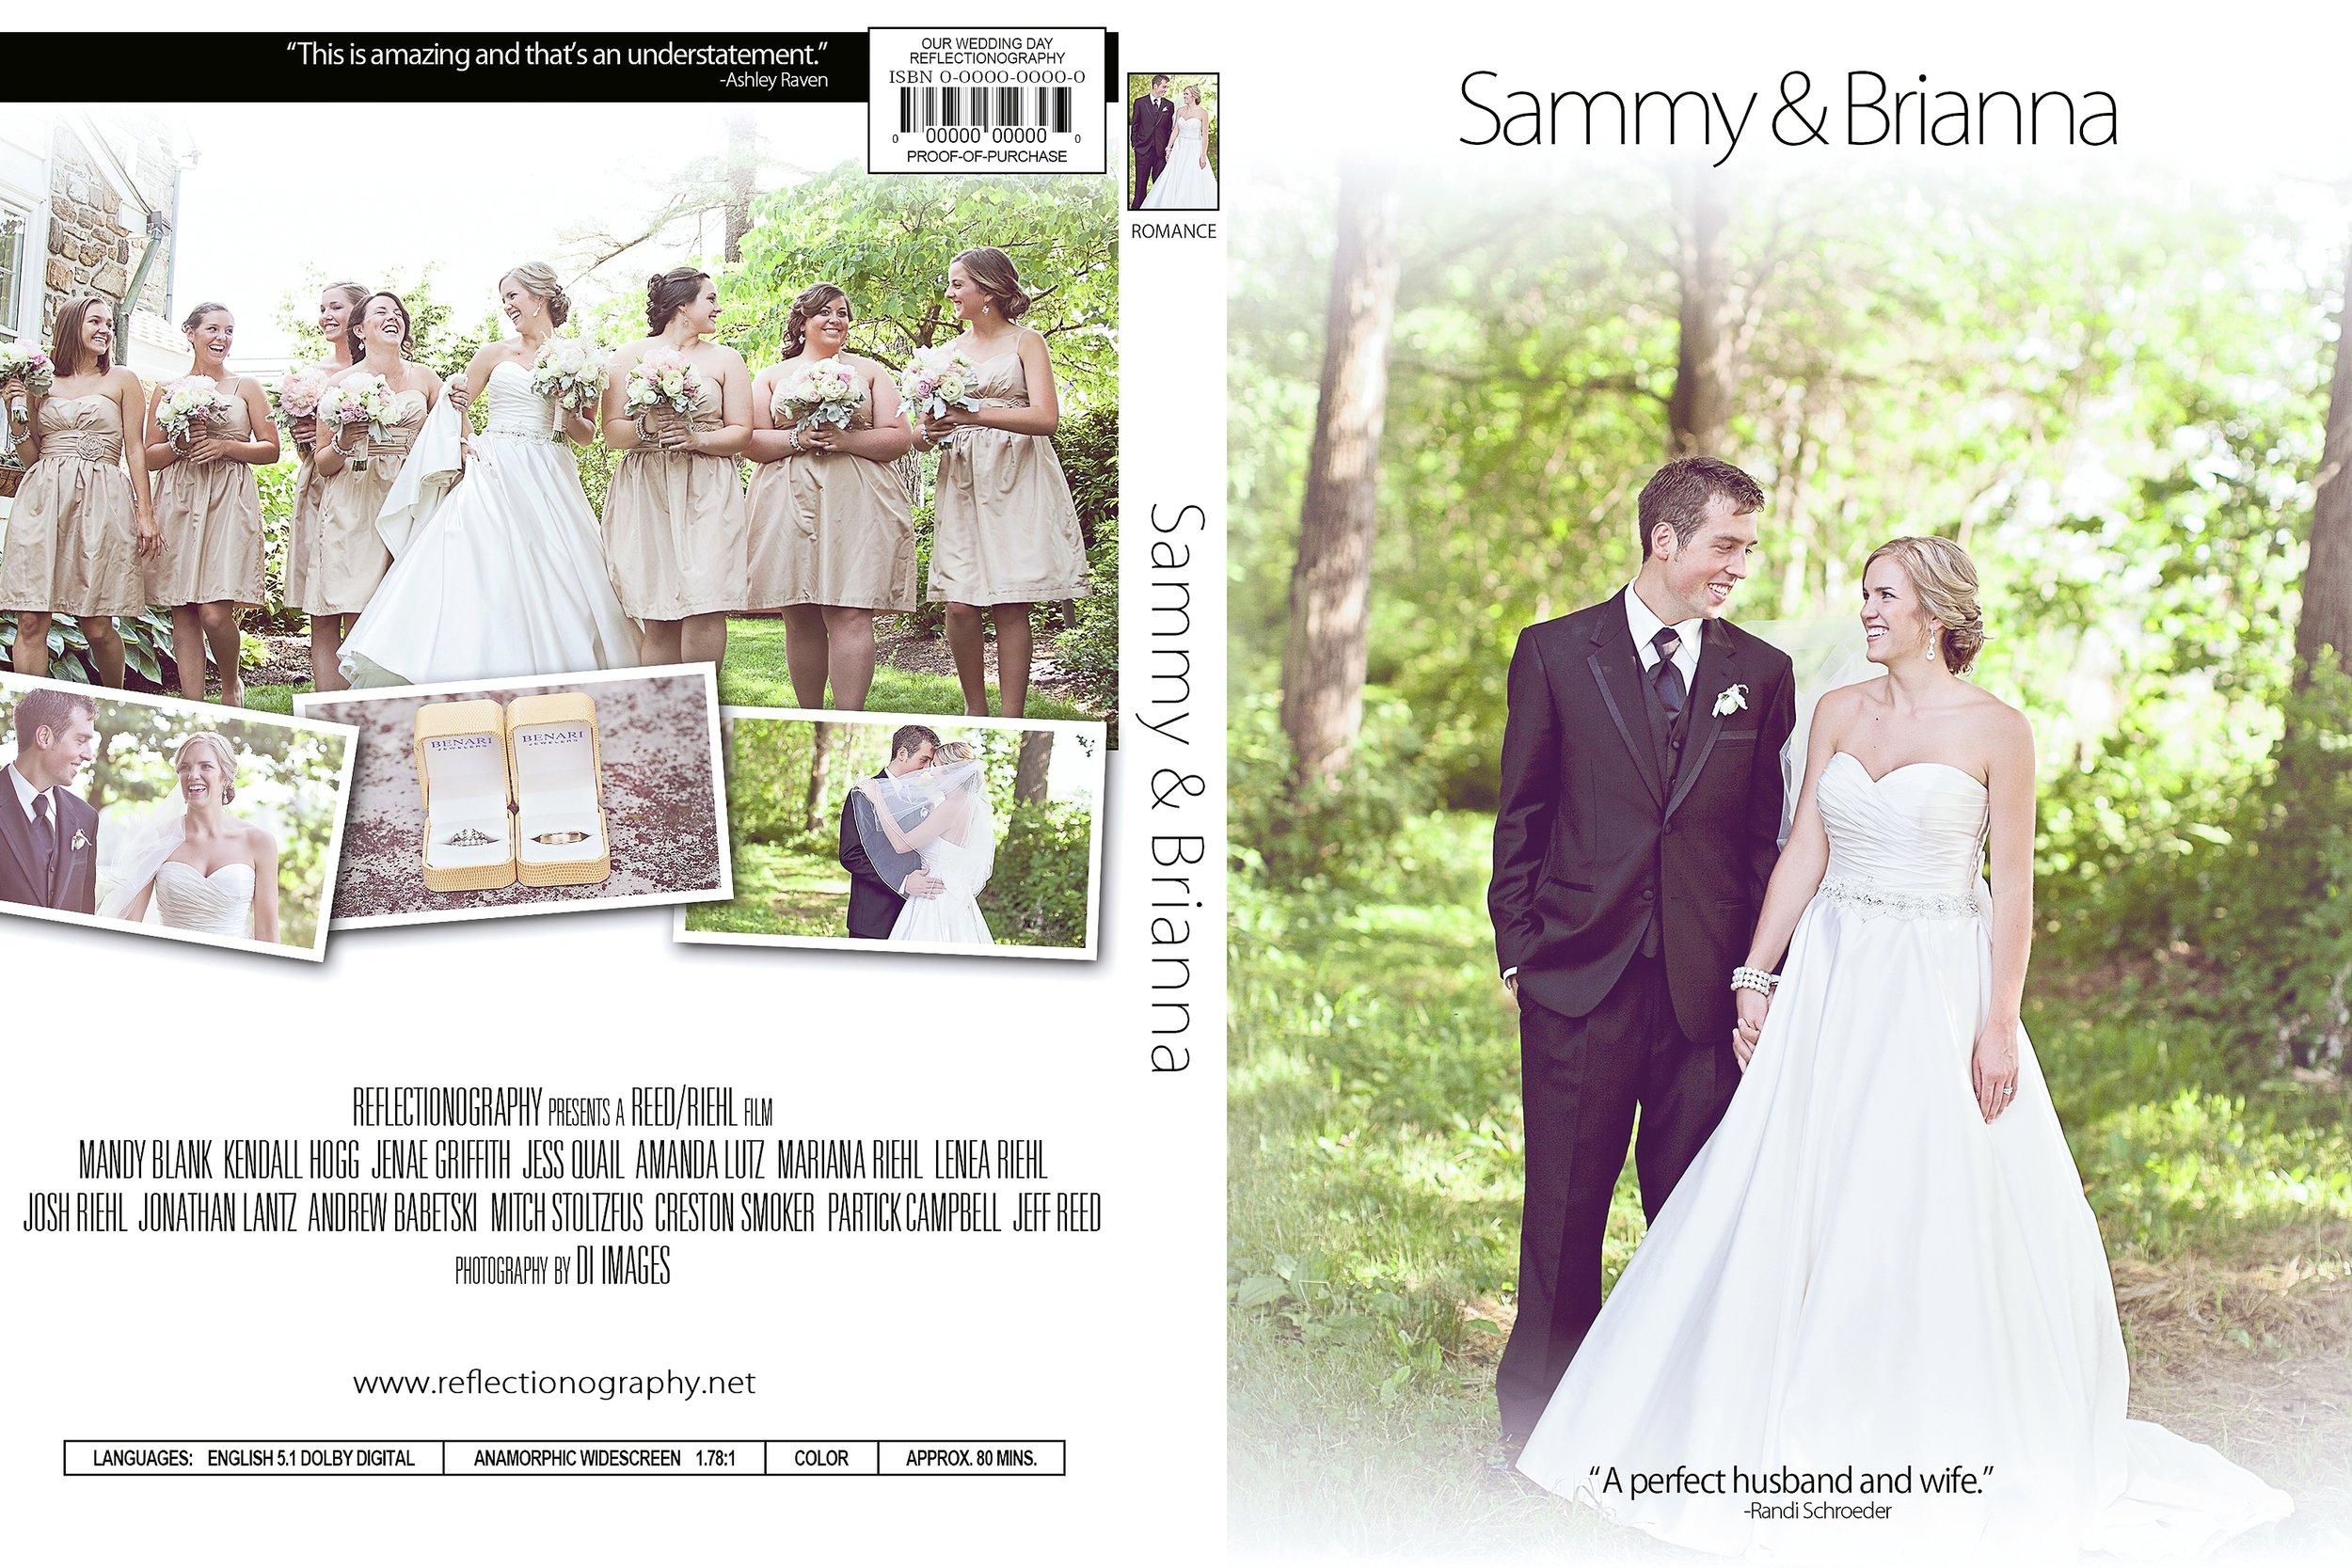 Sammy_Brianna_cover_insert